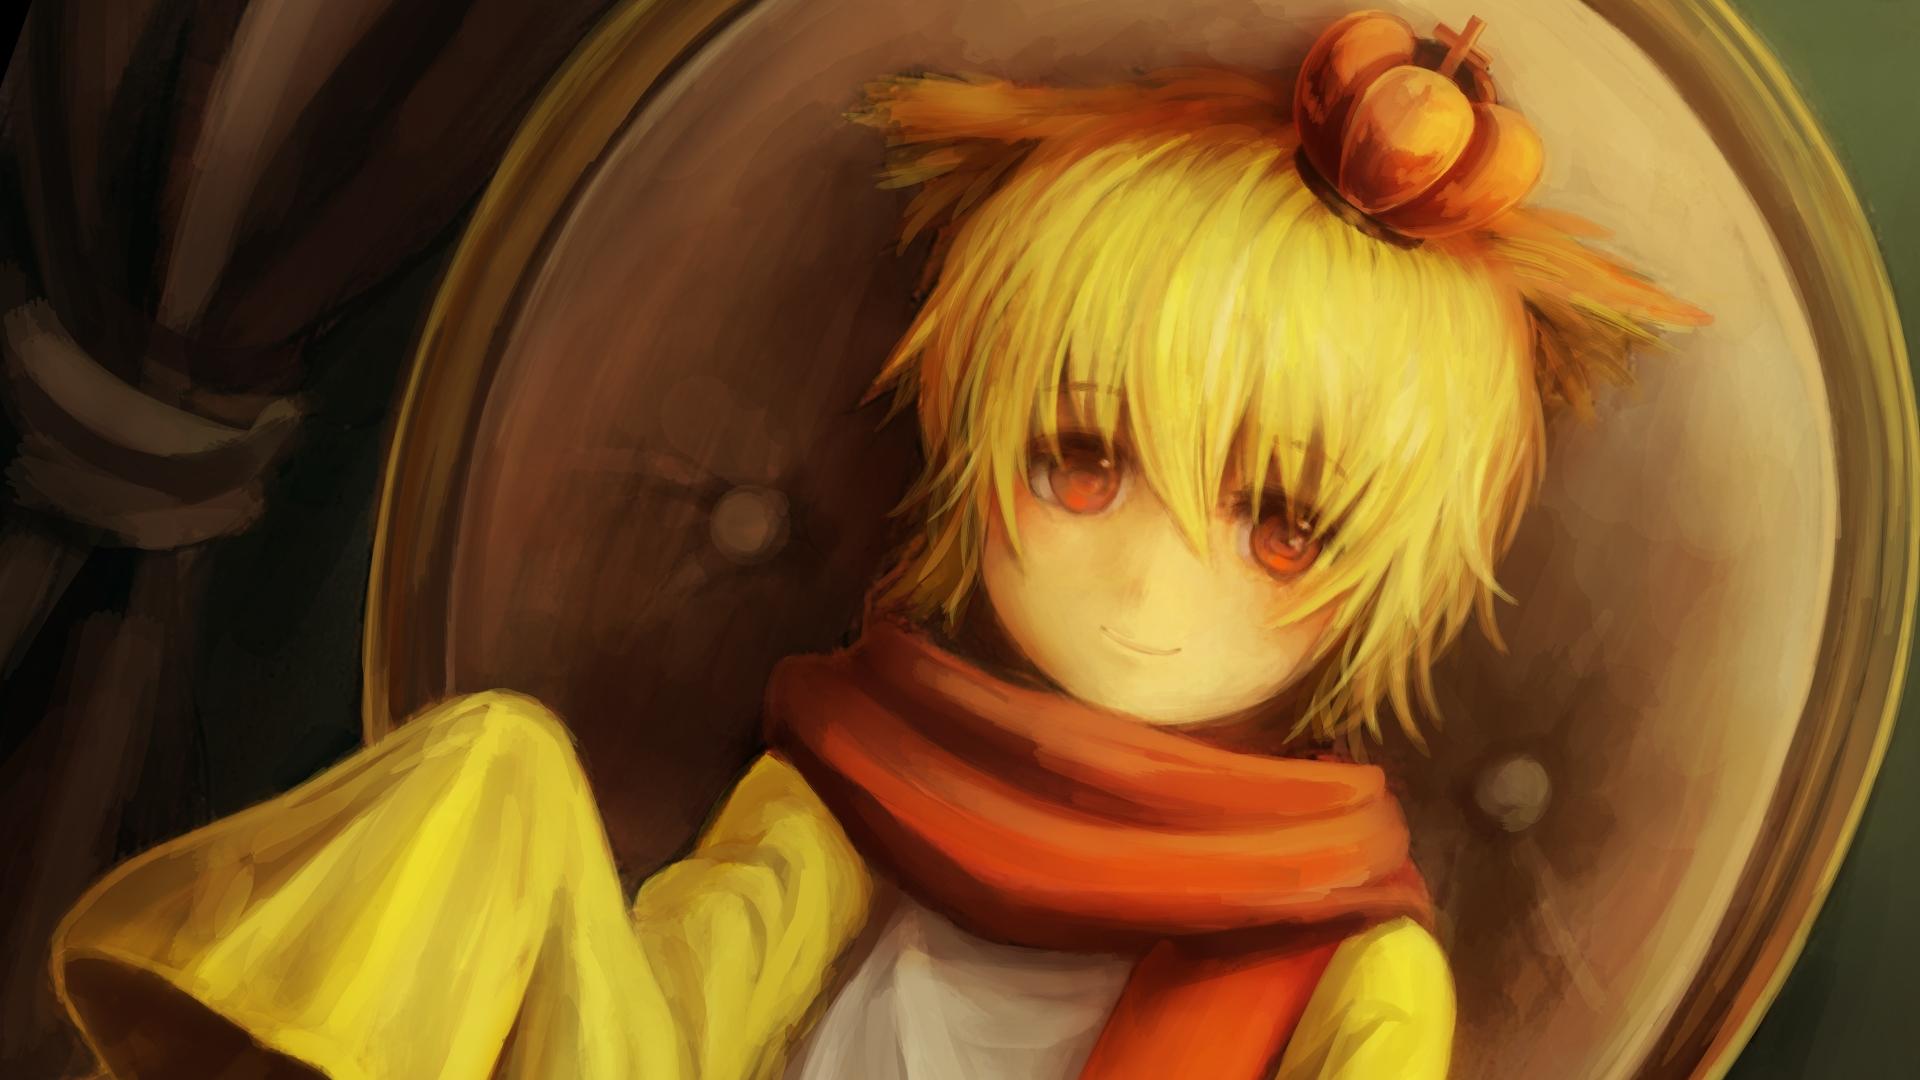 Az Shotatteiiyone Zerochan Anime Image Board